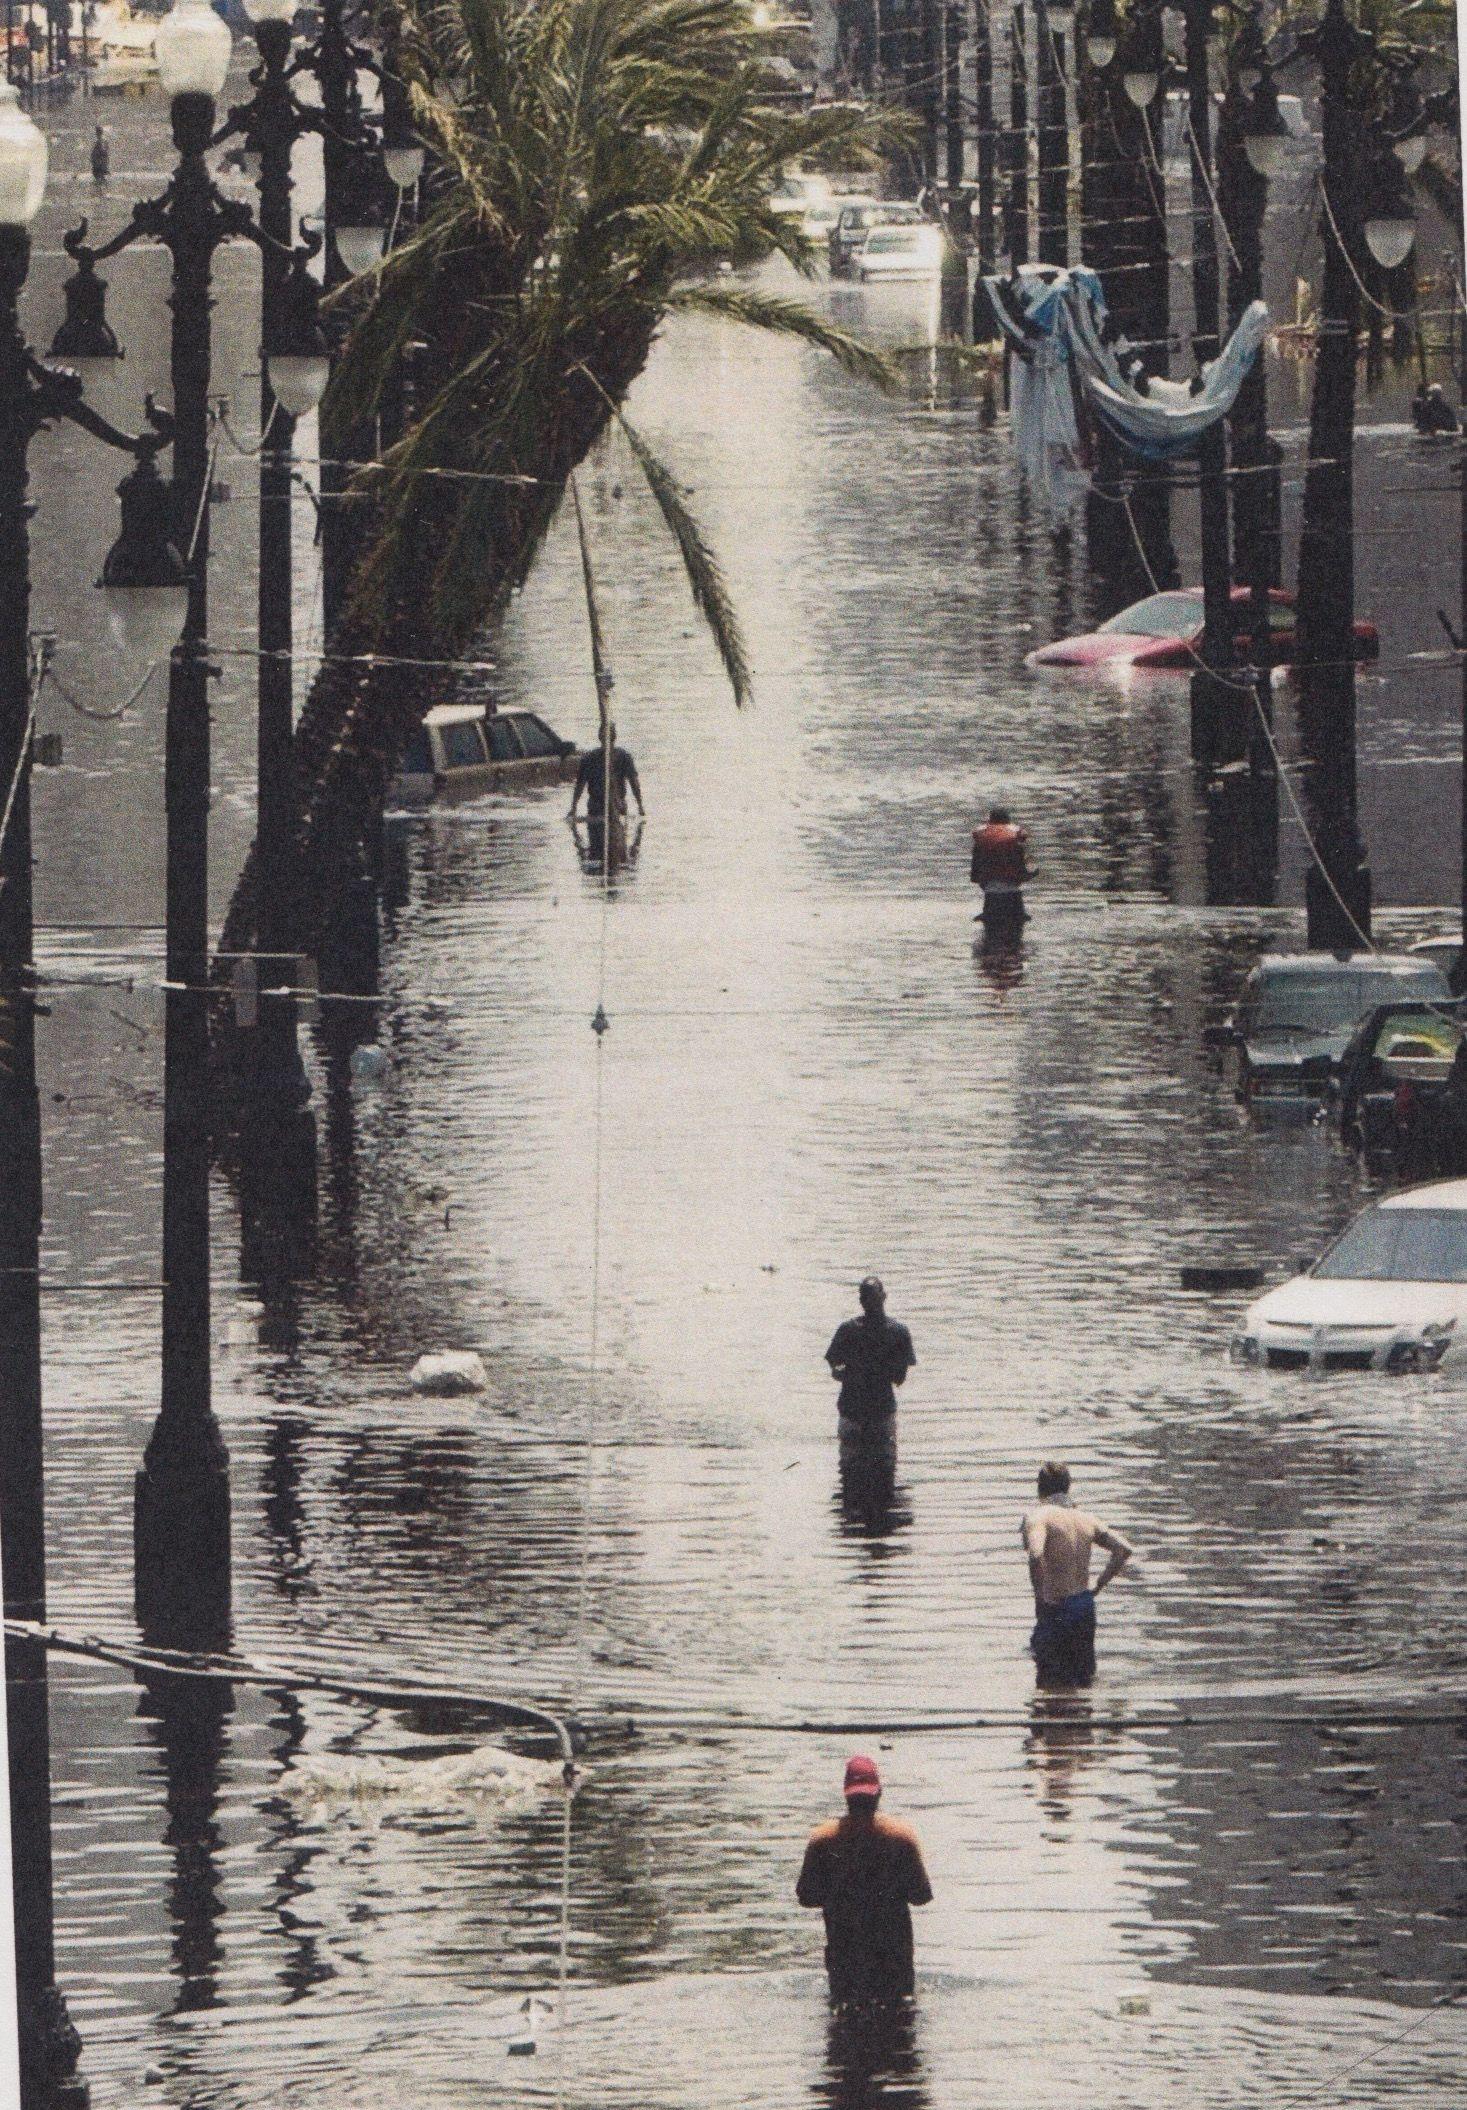 Disaster & refuge John McCusker, 'Canal Street, New Orleans' 2005